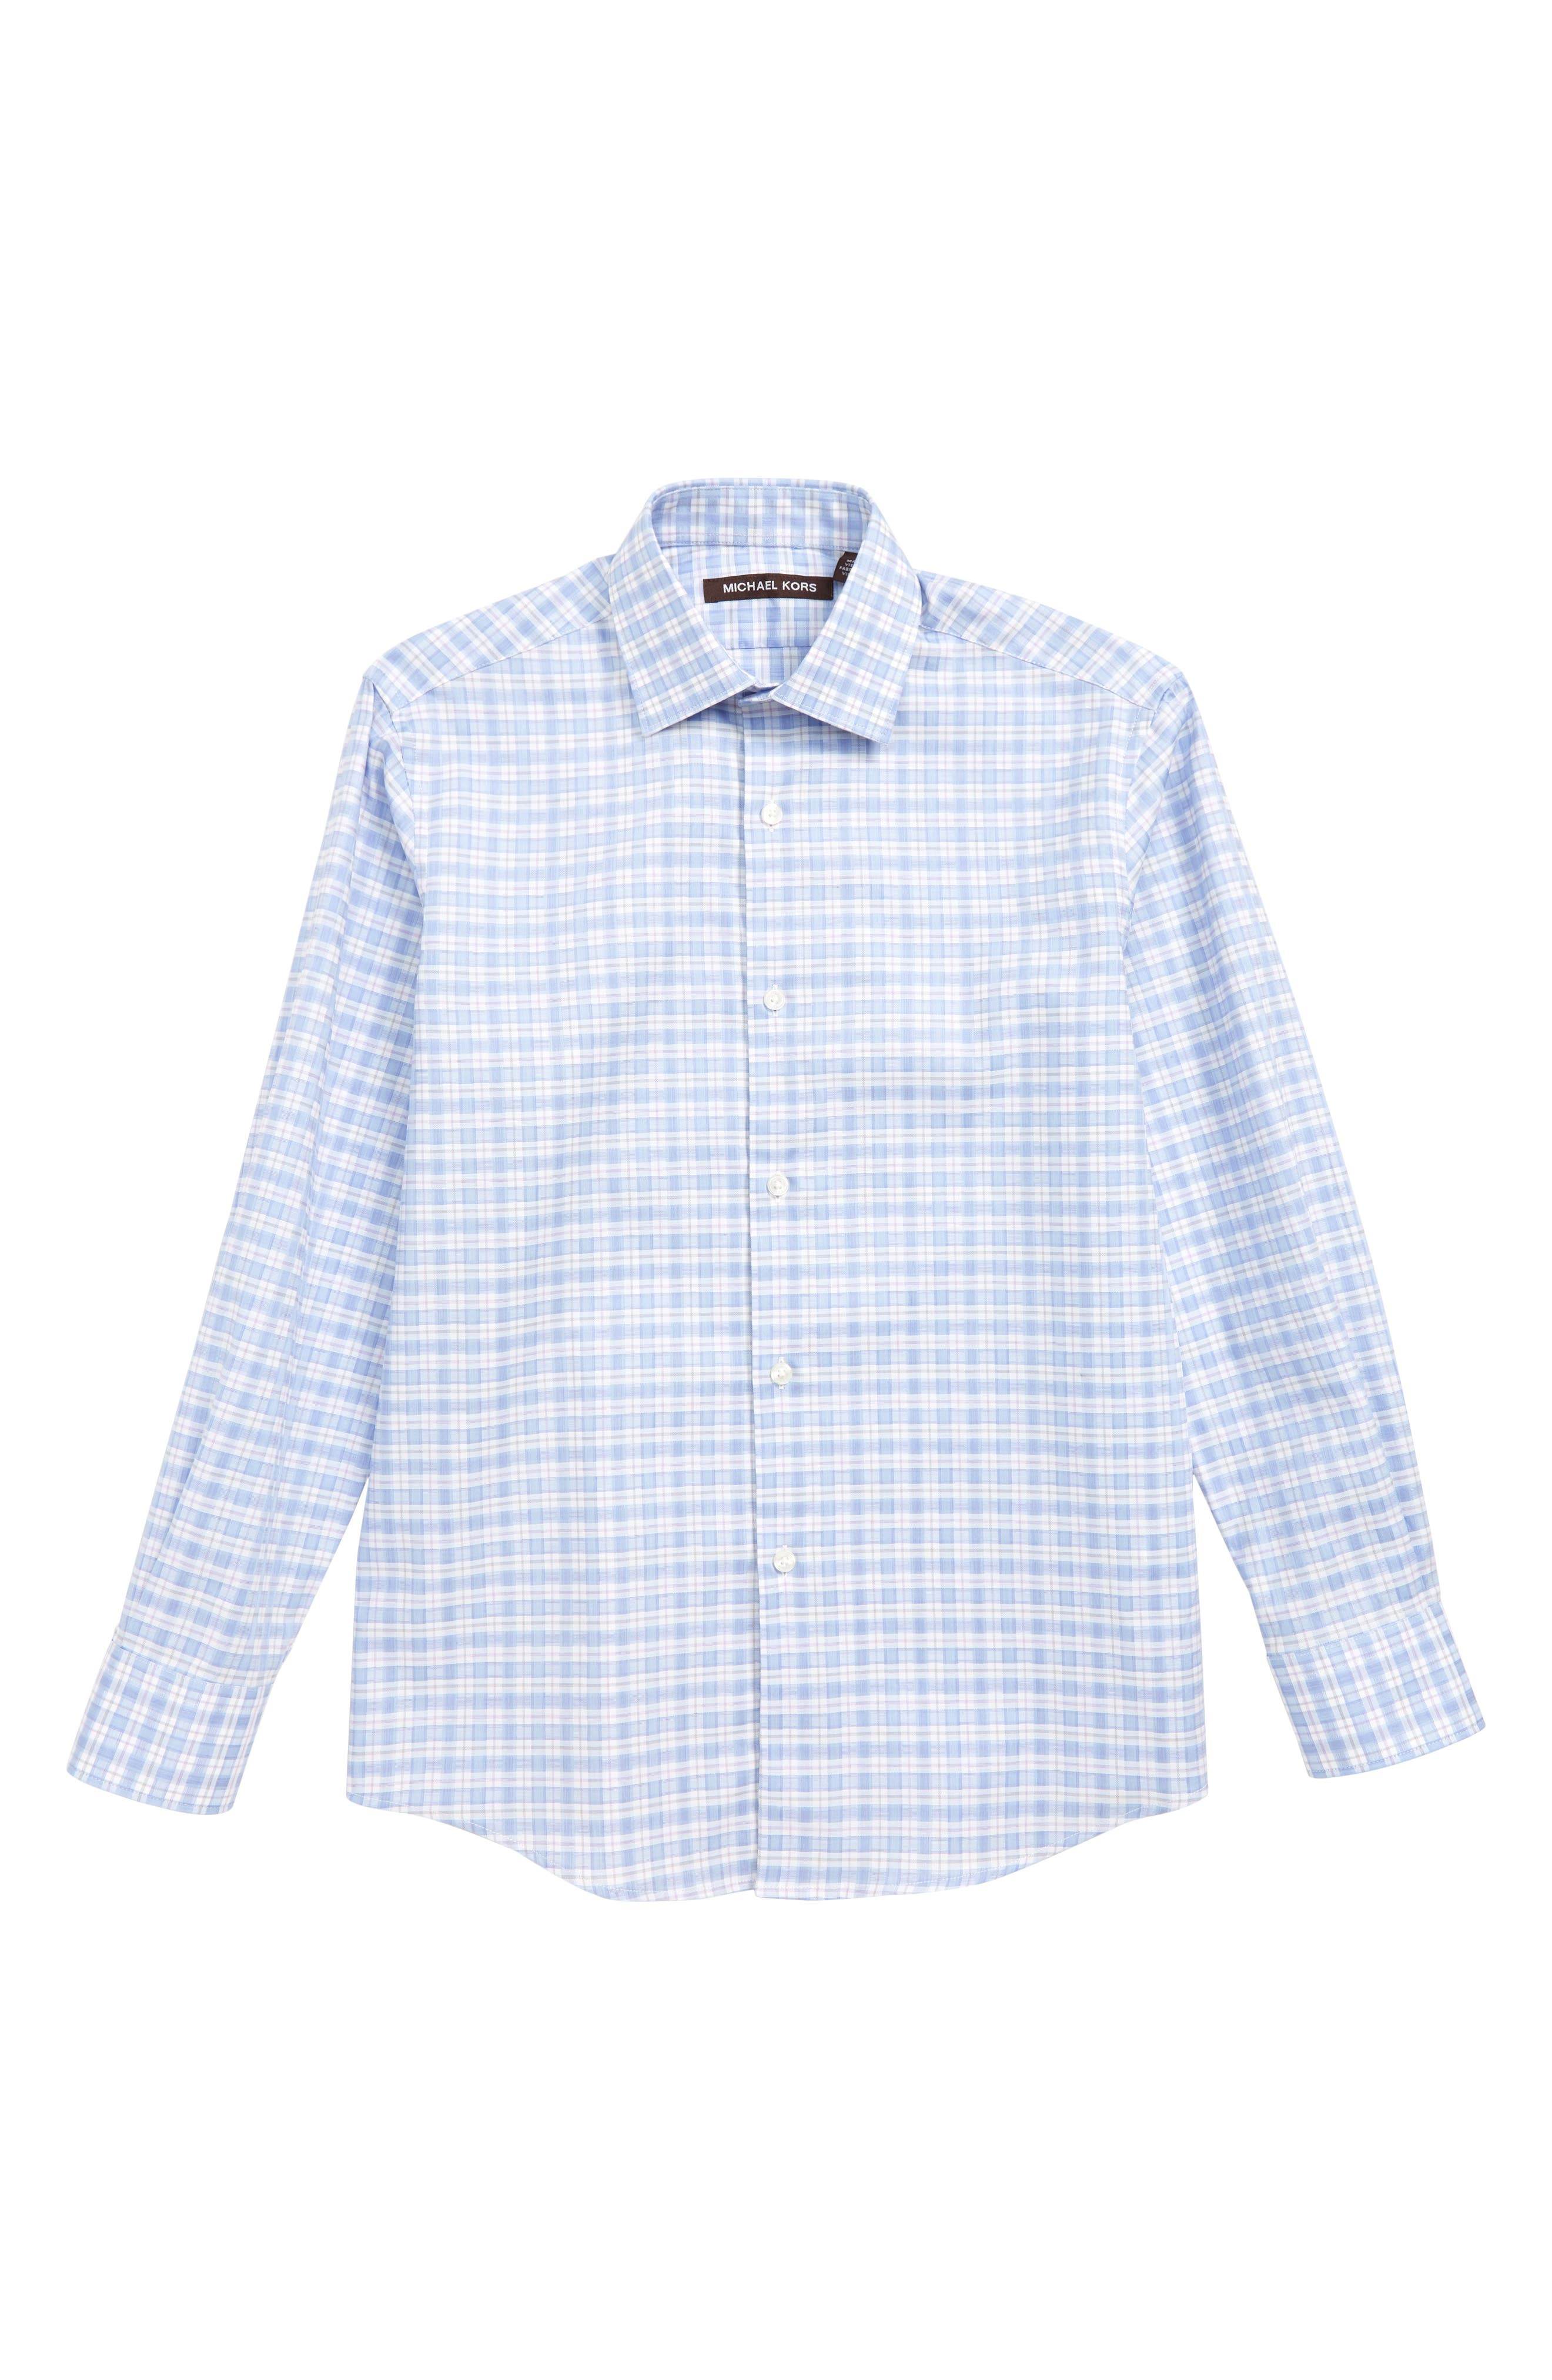 MICHAEL KORS Plaid Dress Shirt, Main, color, BLUE/ PINK